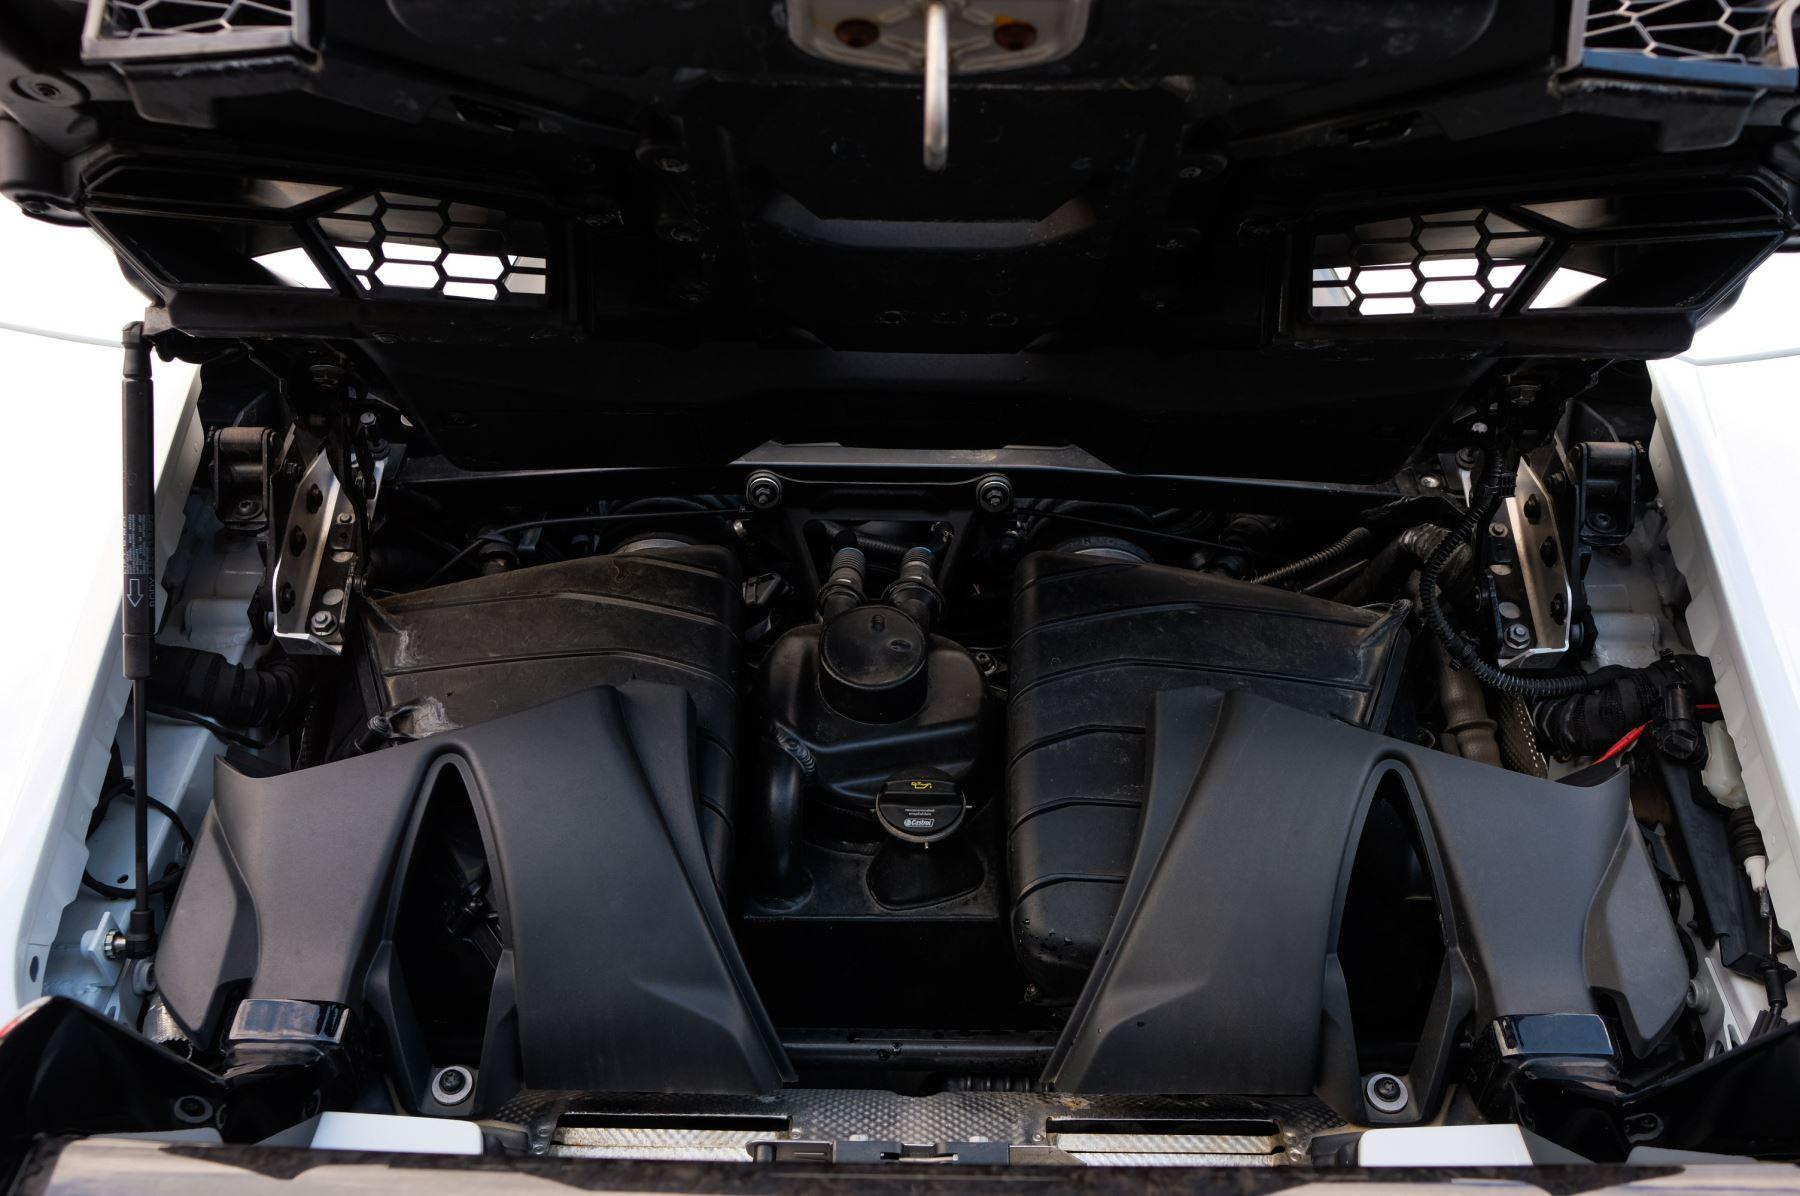 Lamborghini Huracan Performante Spyder 5.2 V10 AWD image 8